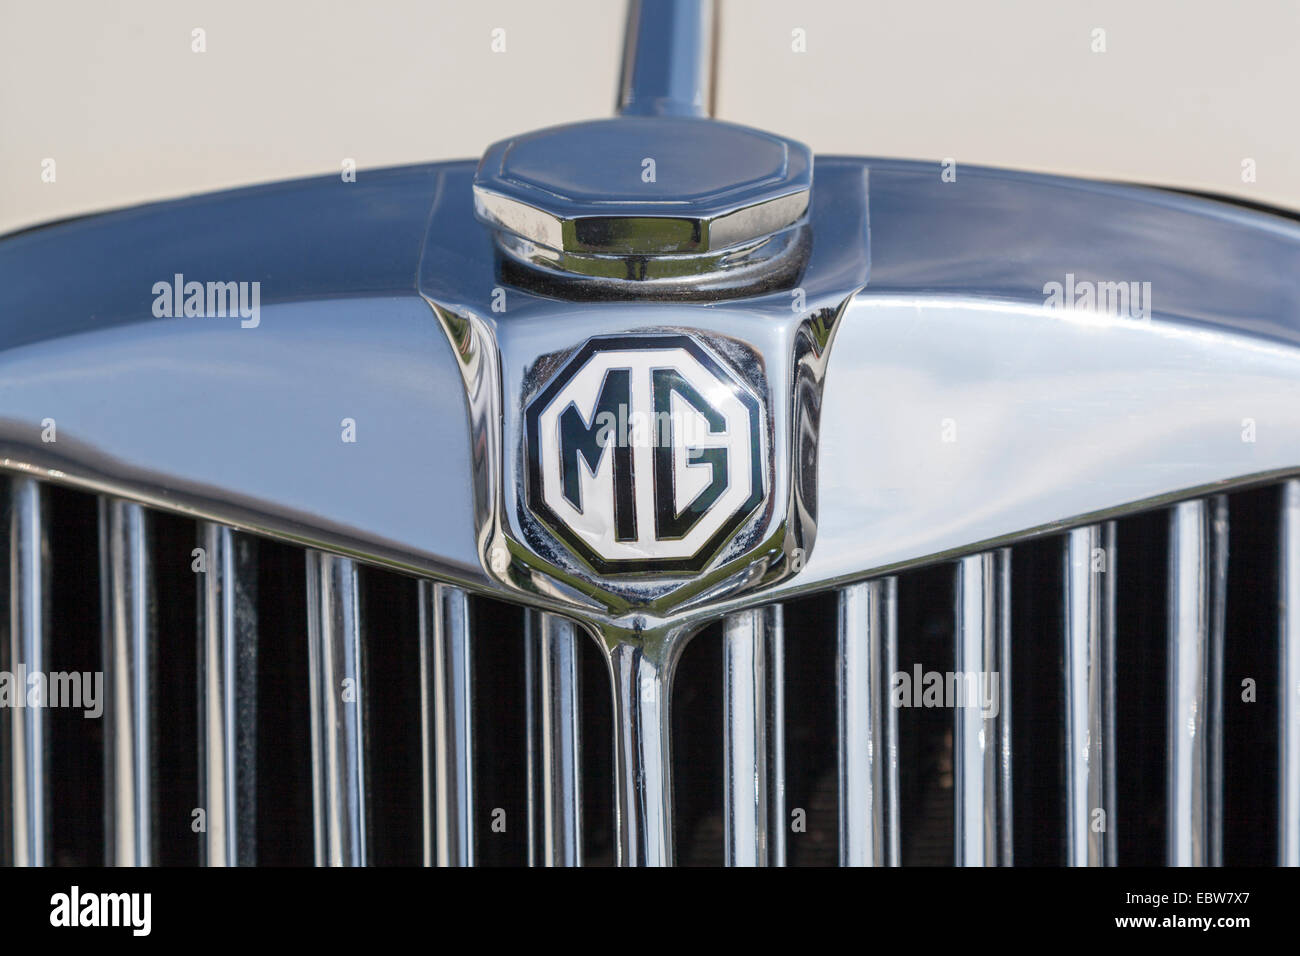 UK, Honley, Agricultural show 2013. MG car badge detail. - Stock Image